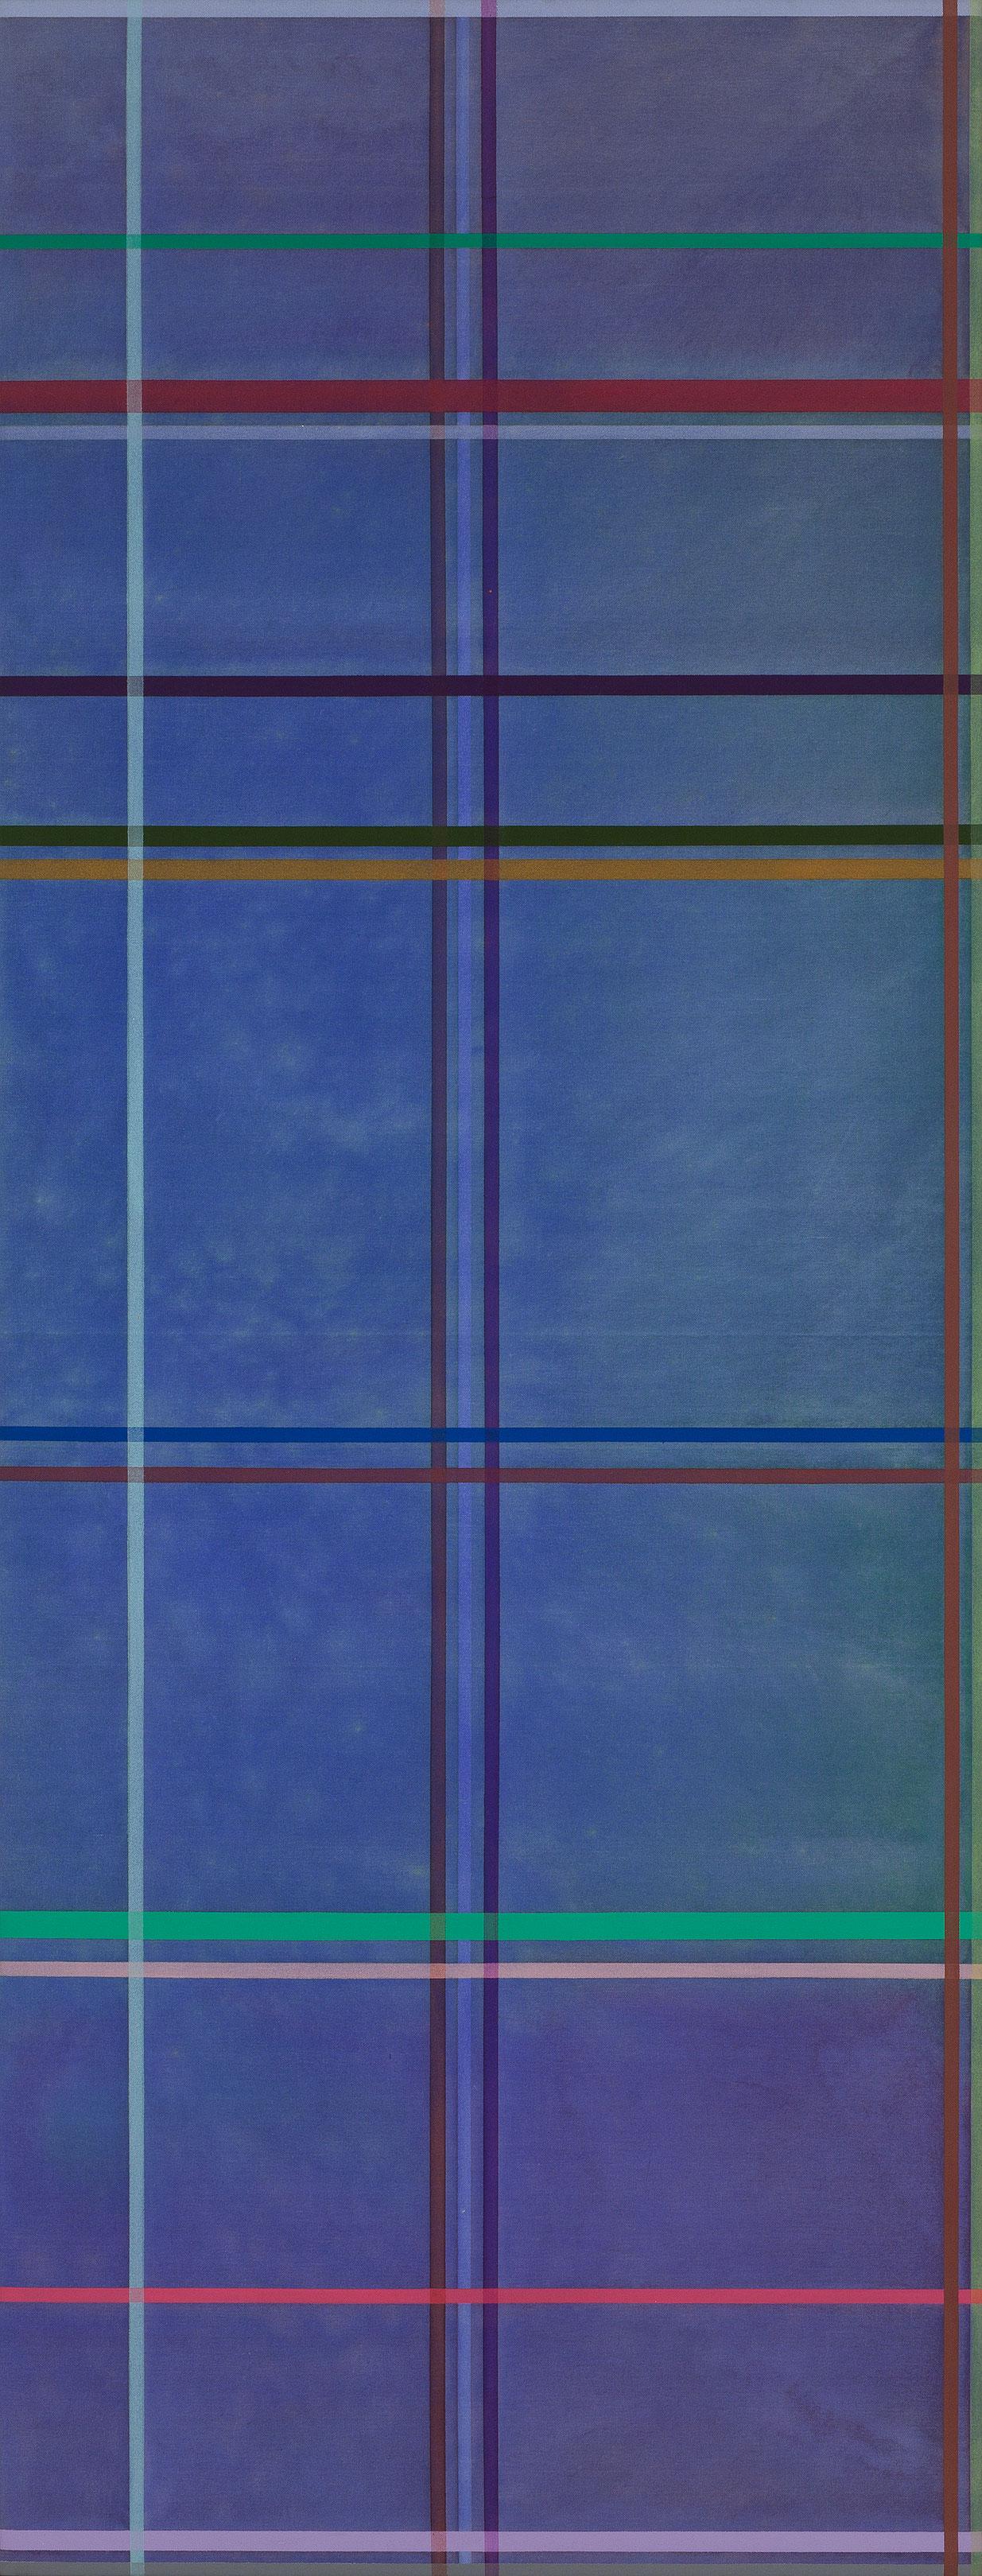 Tipperary Blue, 1971, Kenneth Noland, Acrylique sur toile.